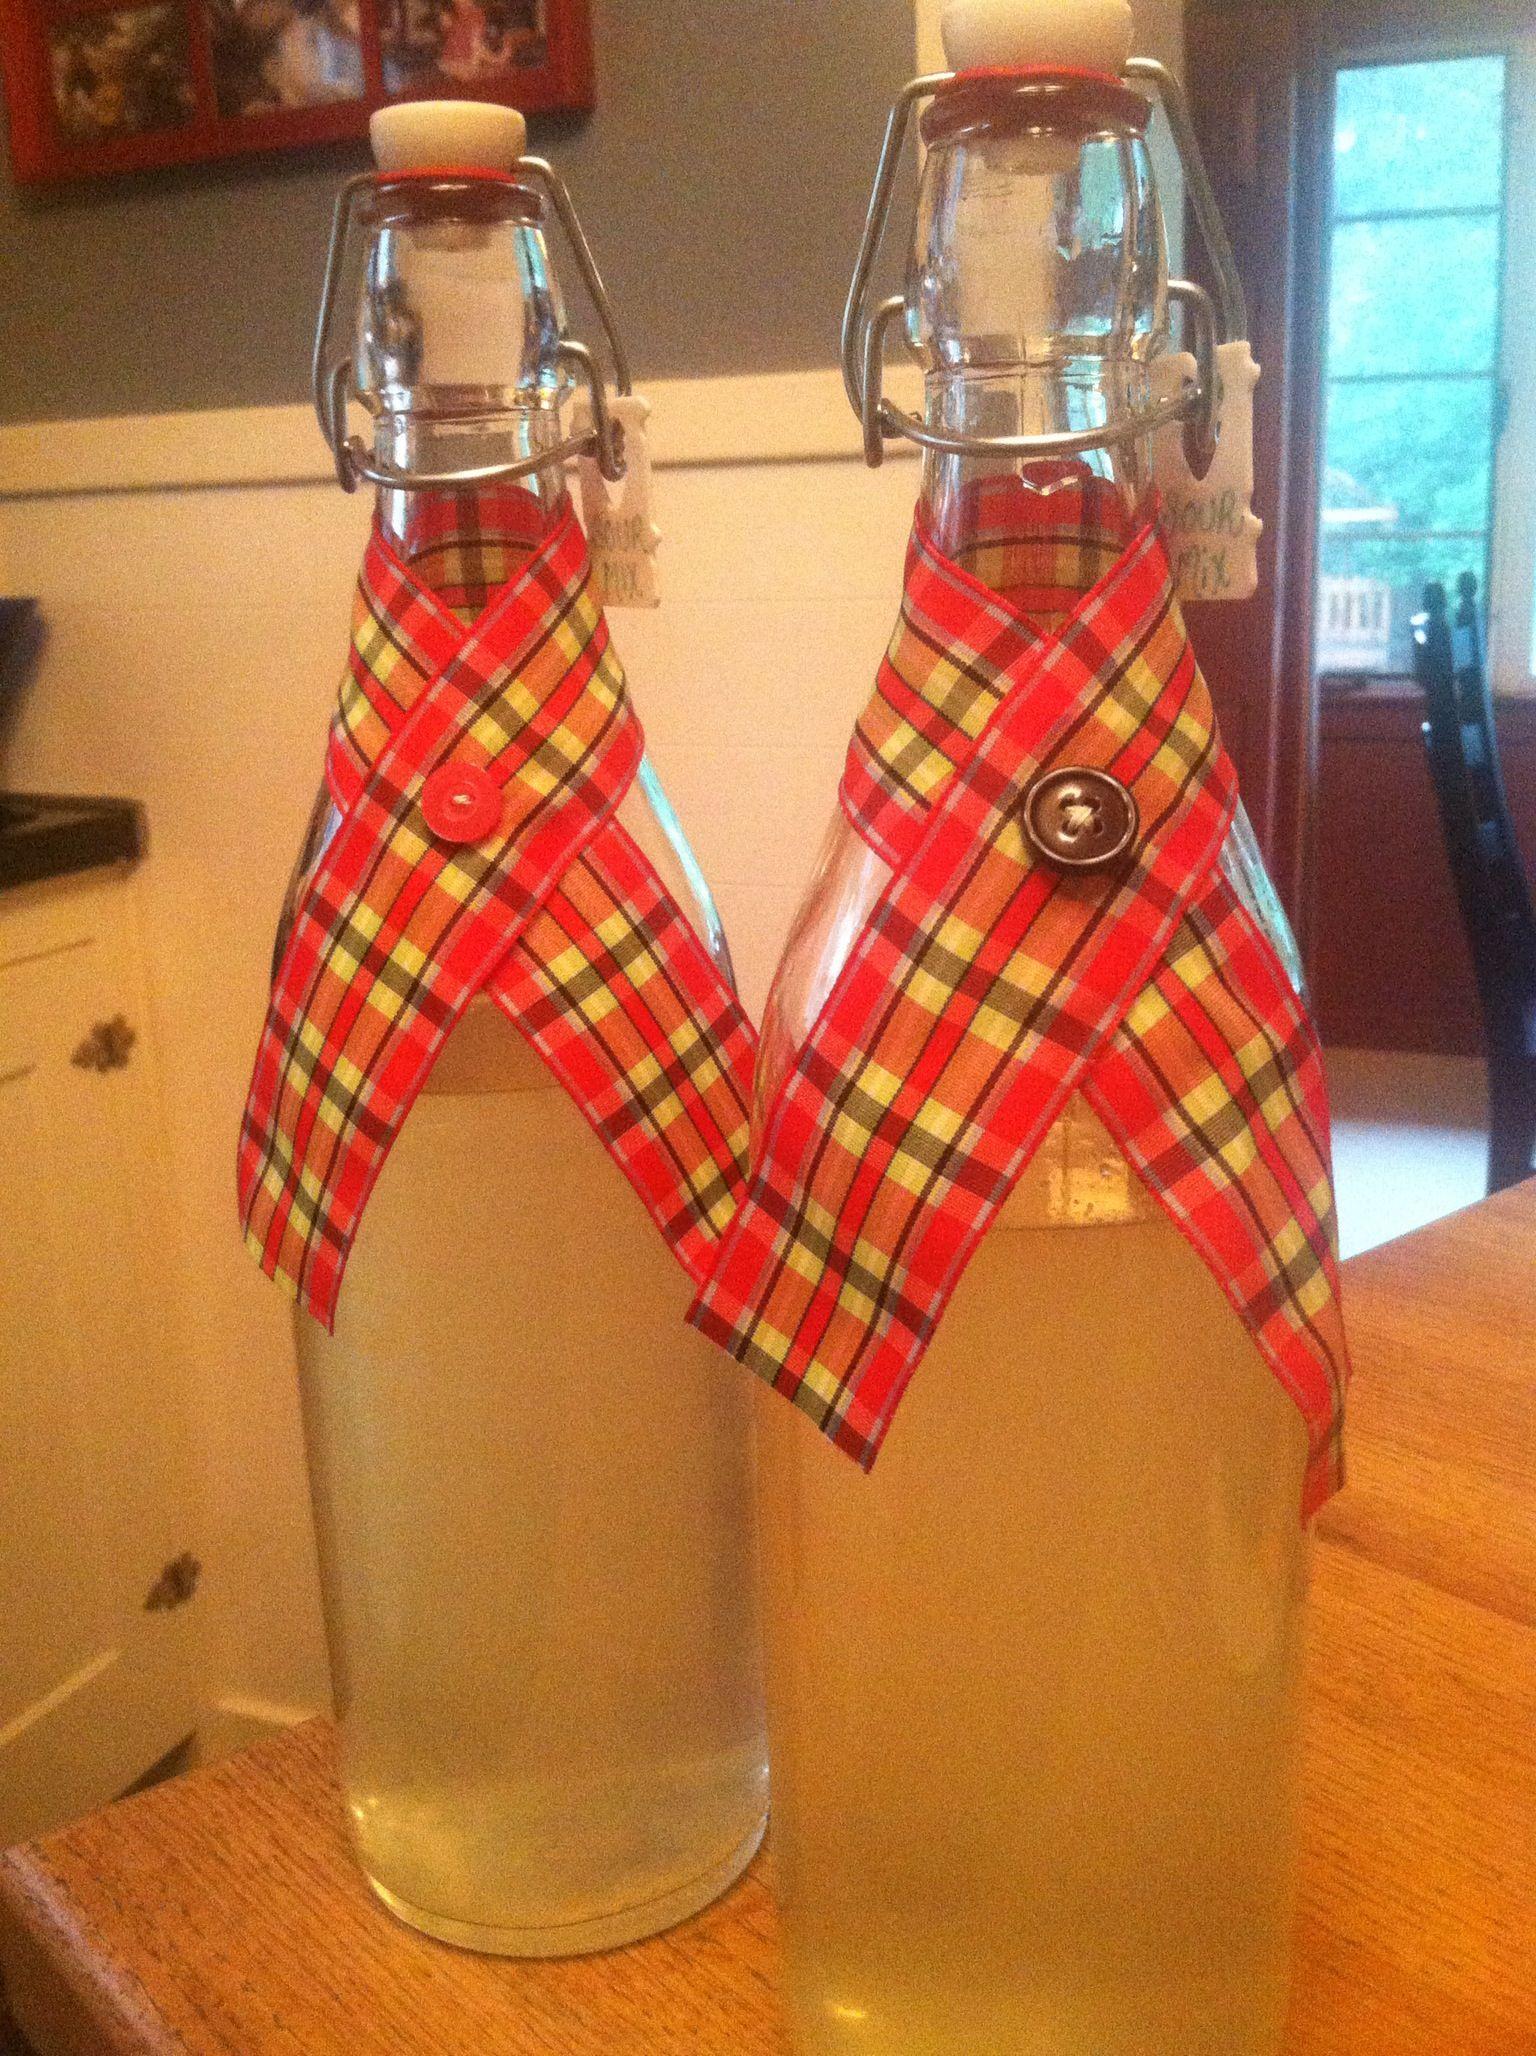 Host/hostess gifts. Homemade sour mix in reusable bottle ...